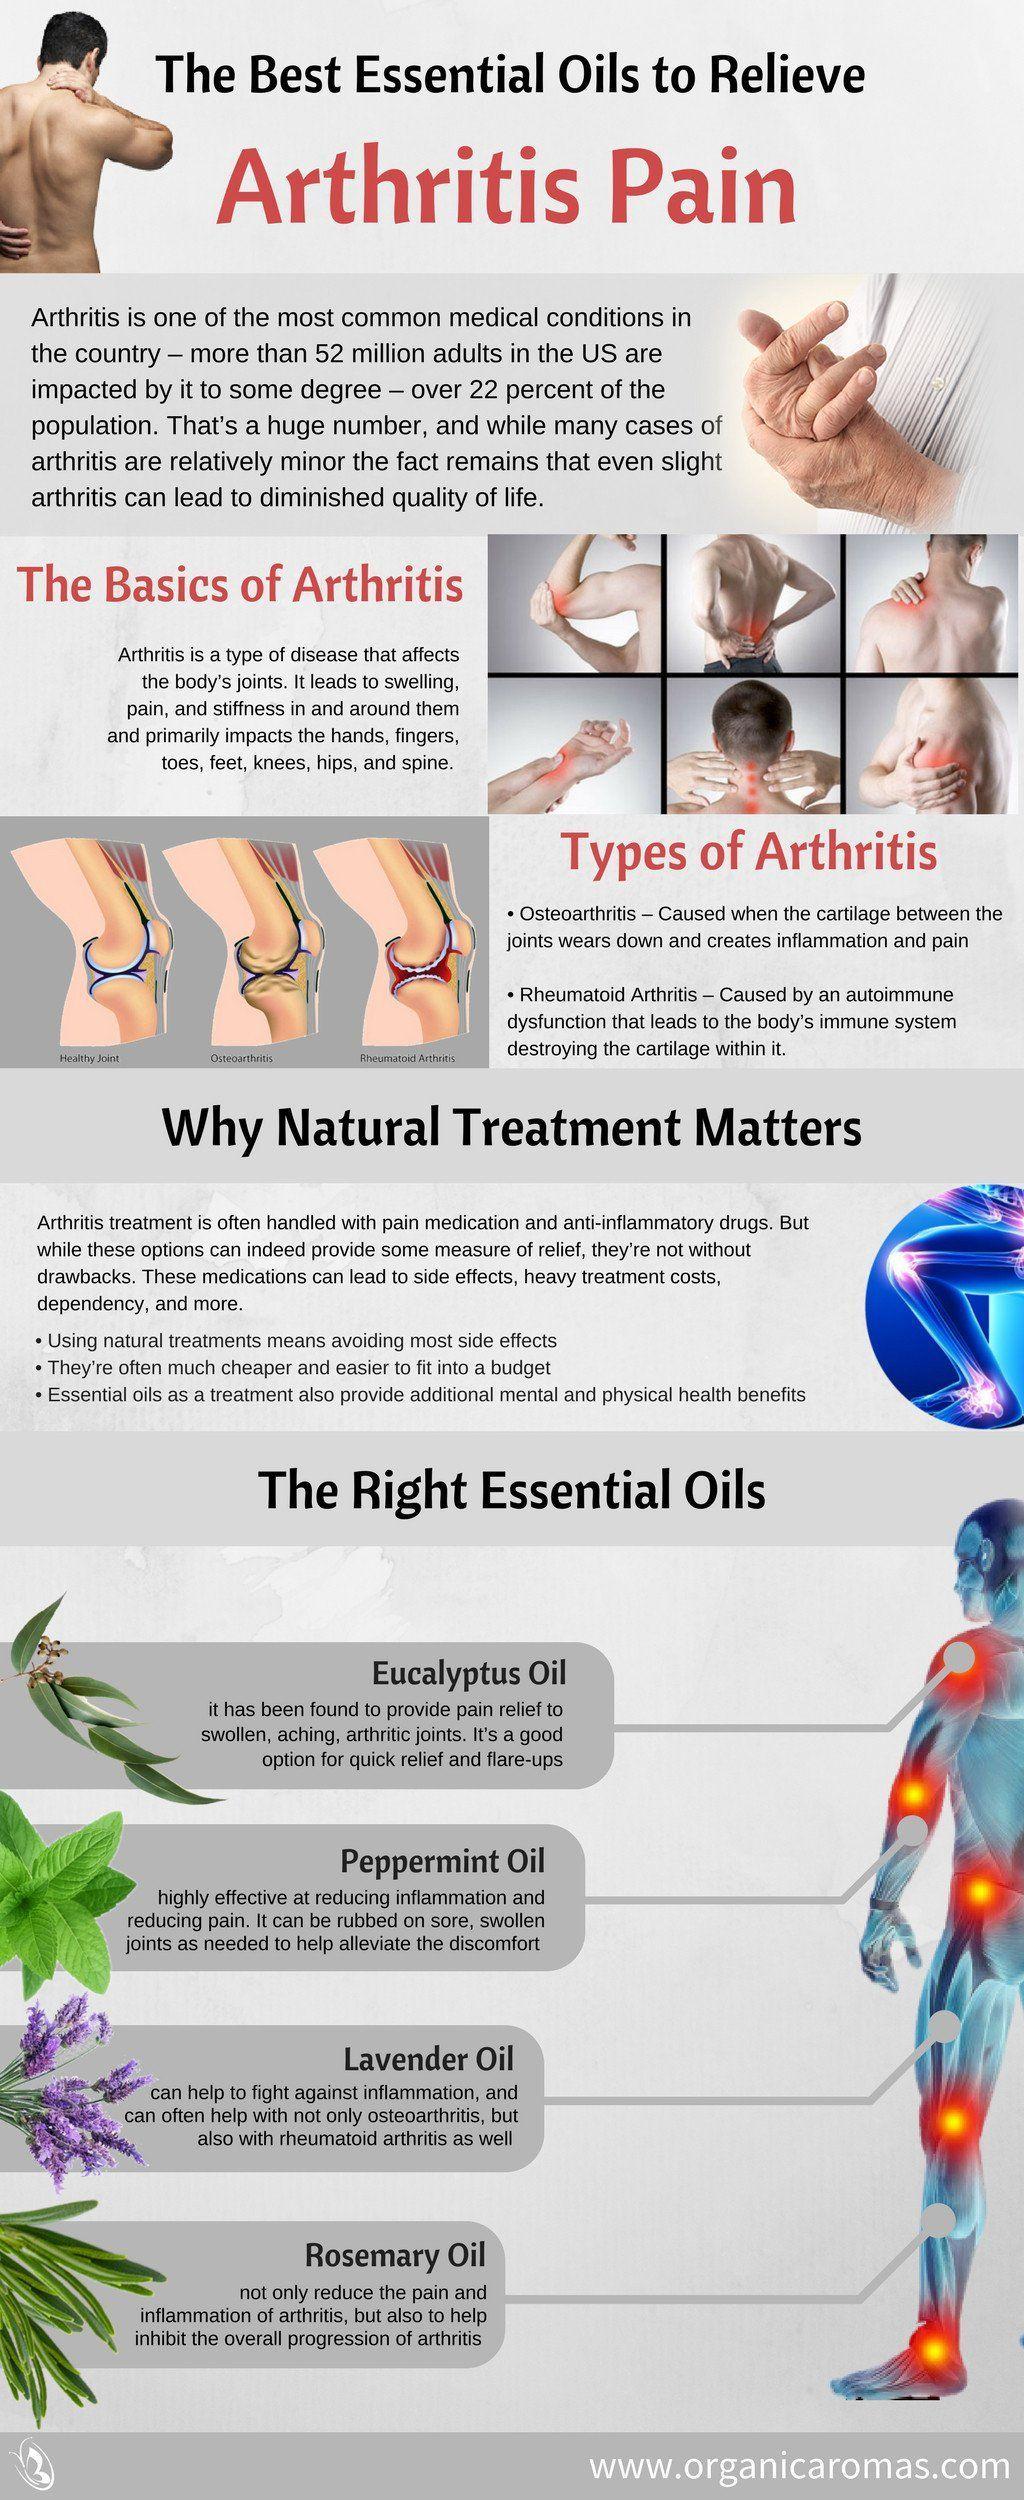 The Best Essential Oils To Relieve Arthritis Pain Organic Aromas Arthritisinfo